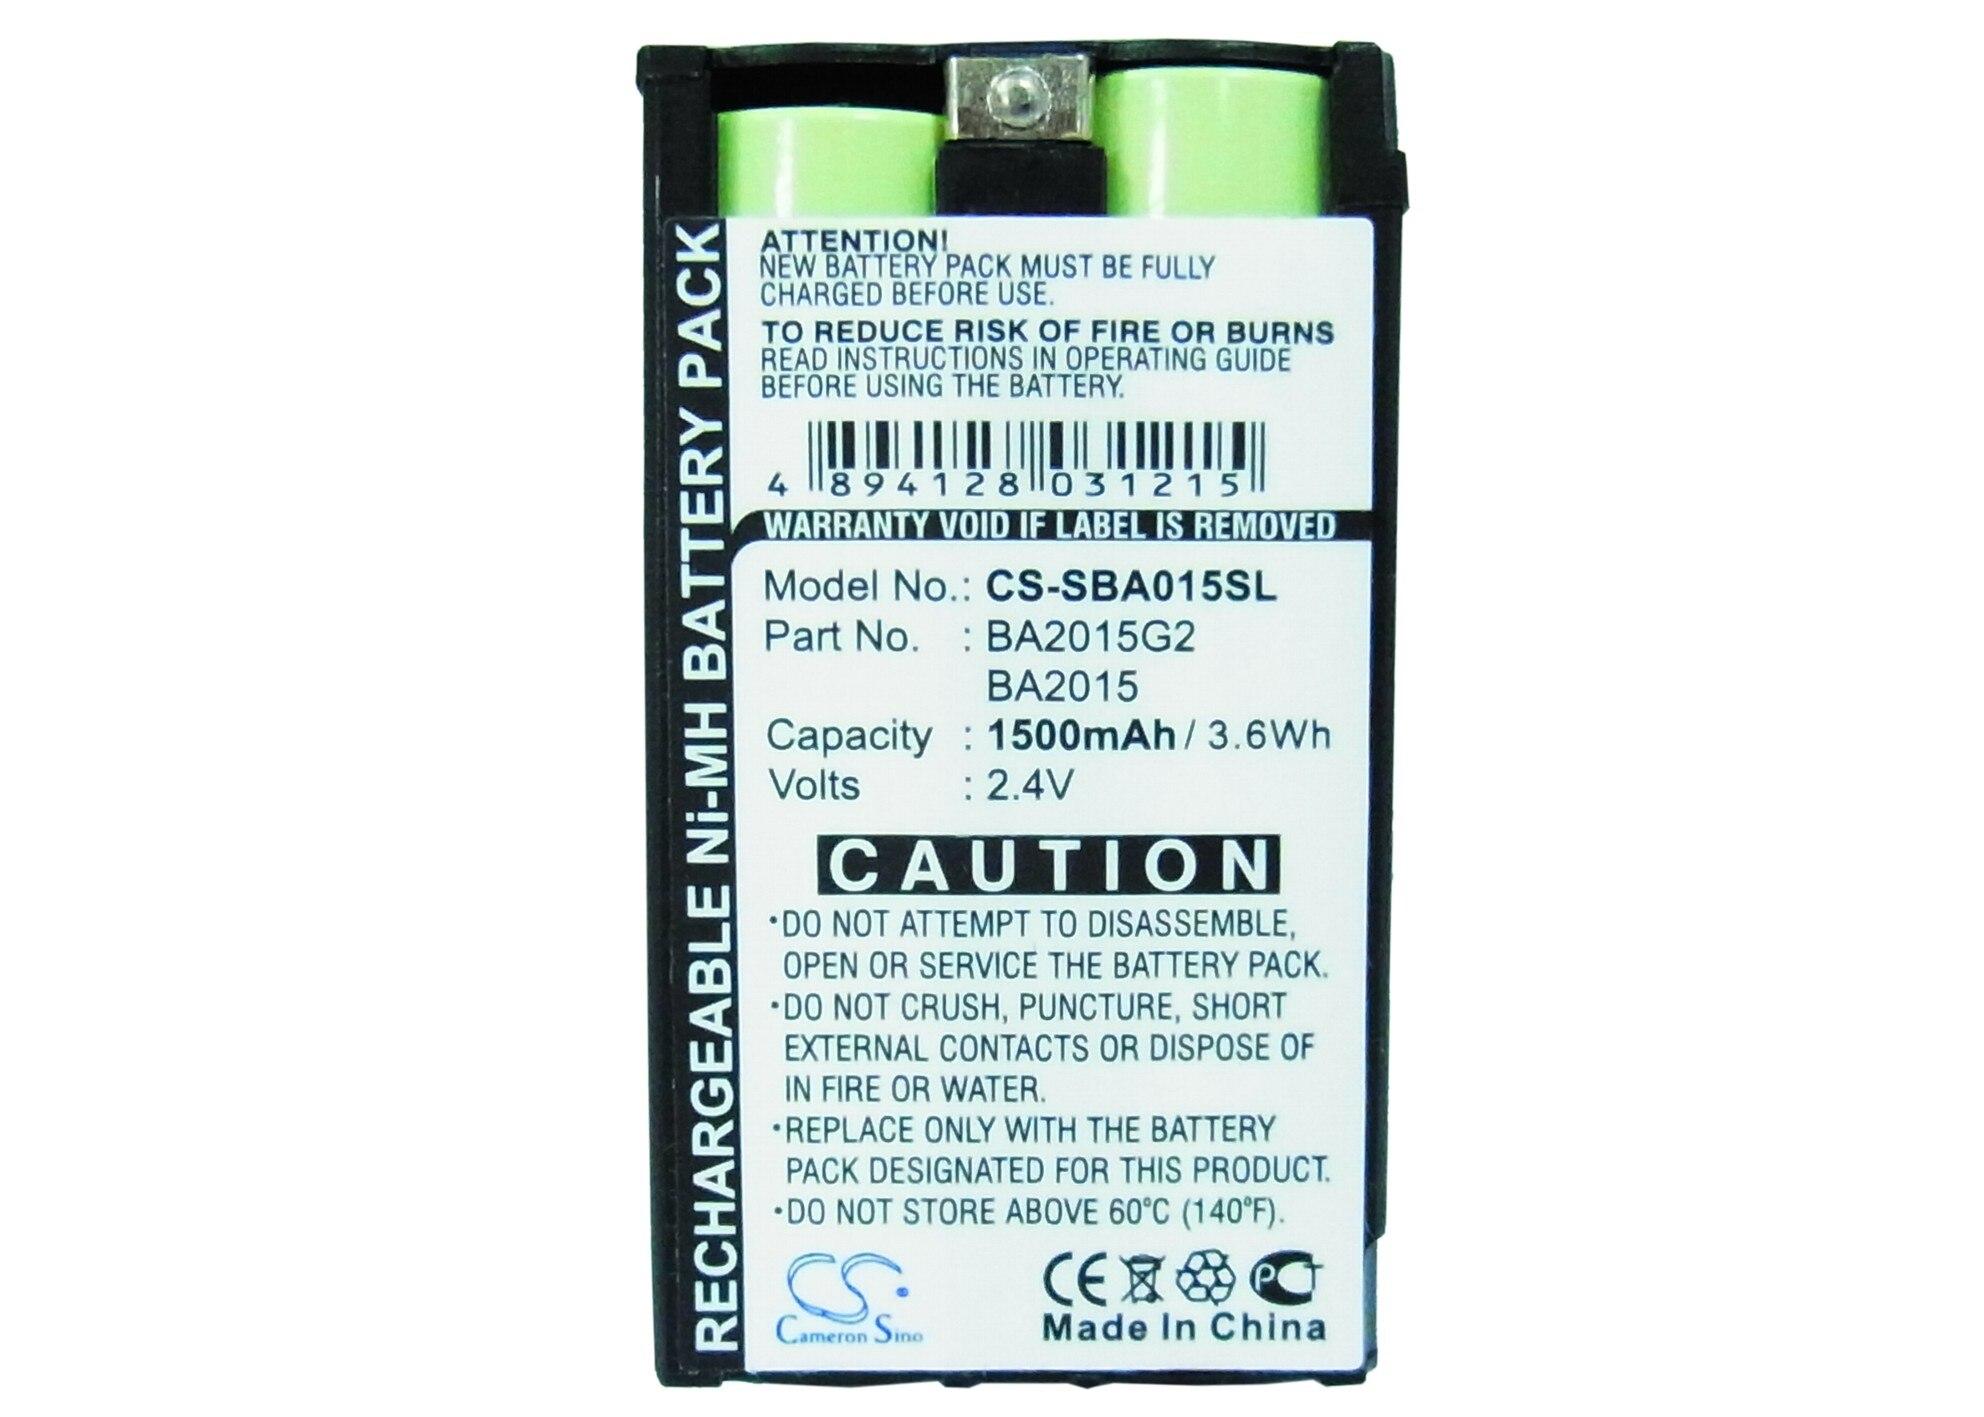 Cameron Sino 1500 mAh batterie BA2015, BA2015G2 pour Sennheiser 2015FM, EK1038, G2Cameron Sino 1500 mAh batterie BA2015, BA2015G2 pour Sennheiser 2015FM, EK1038, G2